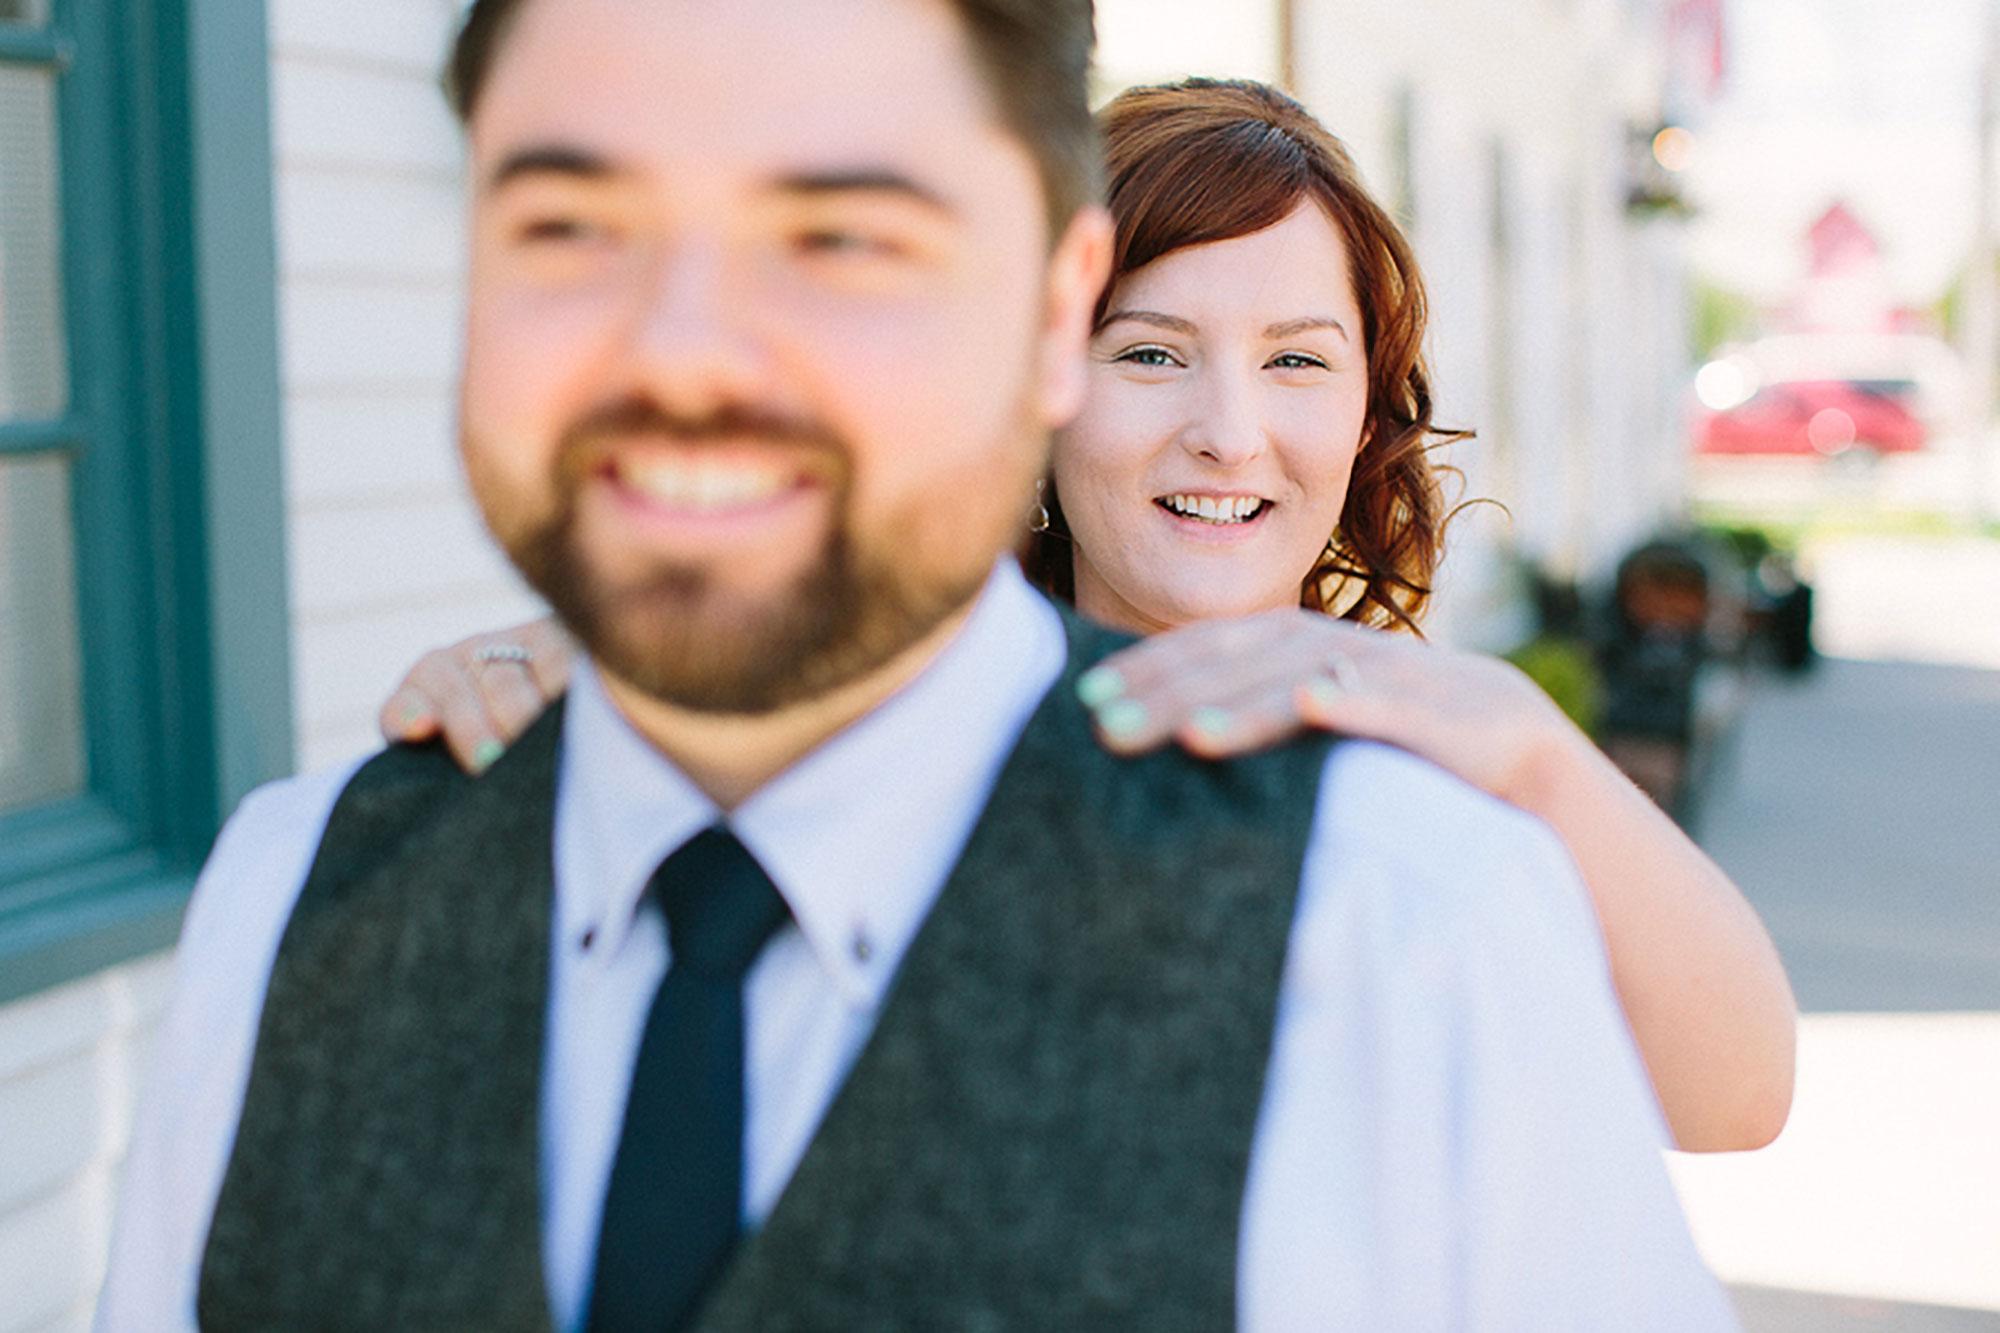 Navy-Hall-Wedding-Vineyard-Bride-Photo-By-Andrew-Mark-Photography-009.jpg